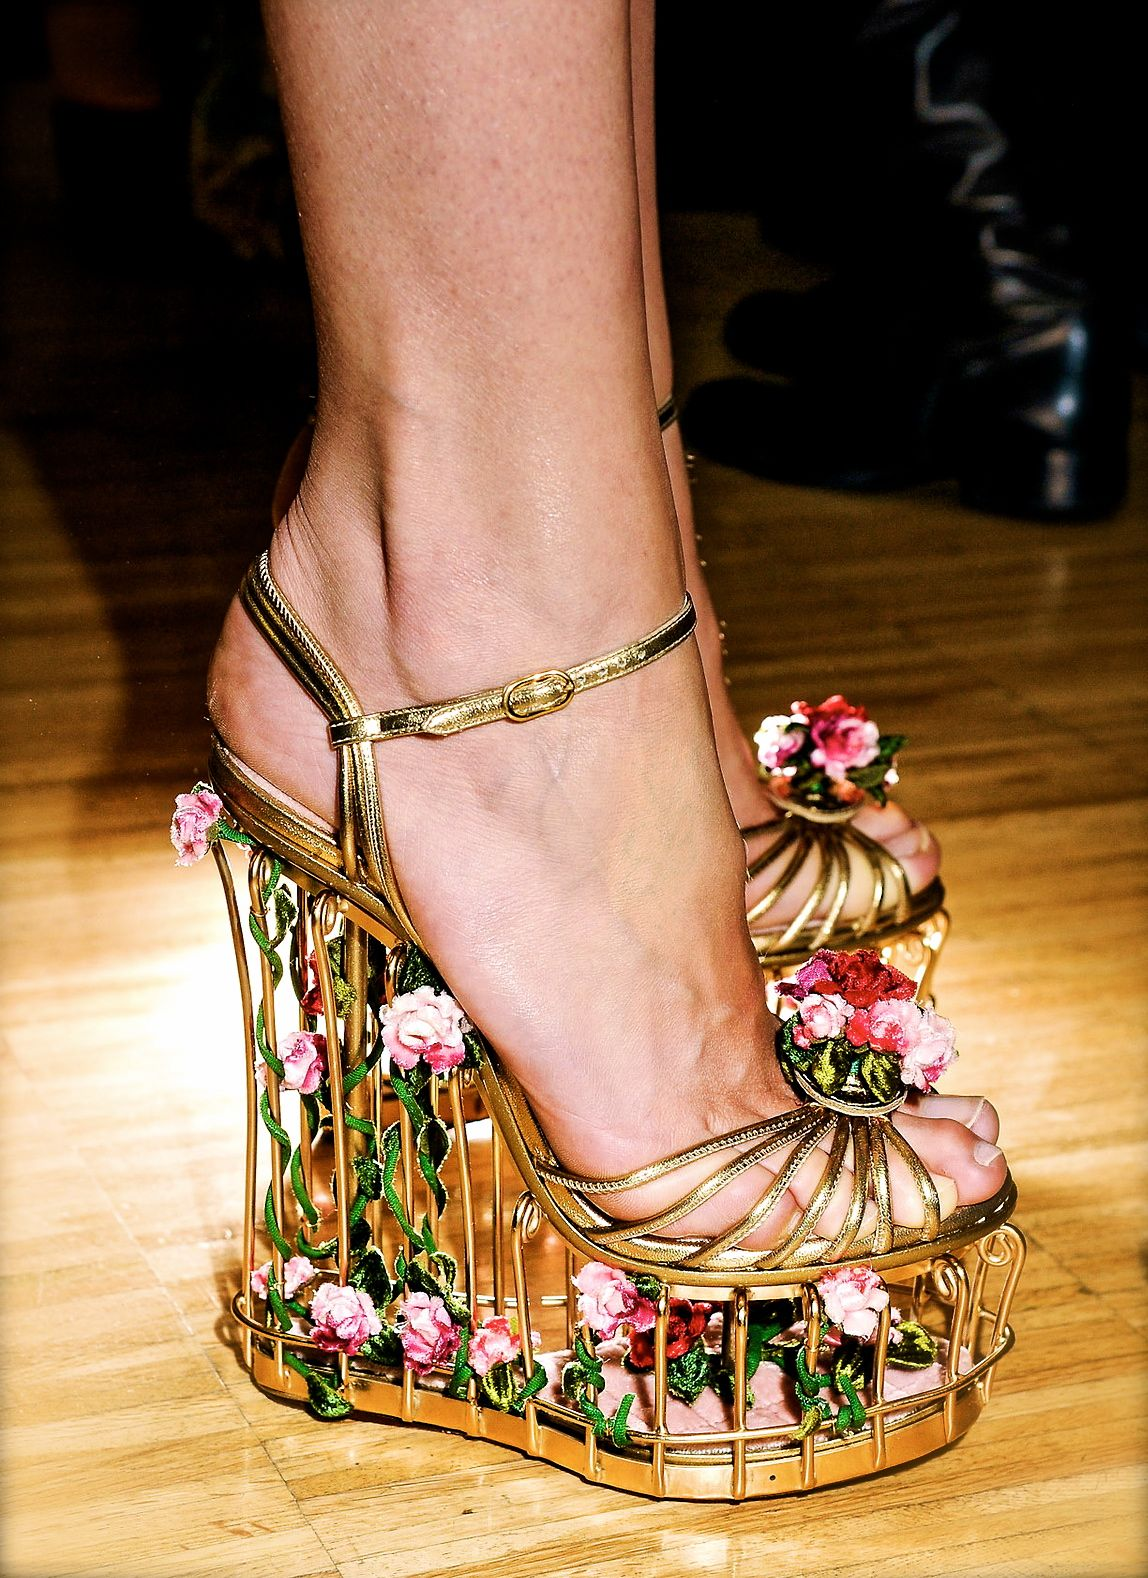 Dolce and Gabbana, model, haute couture, | high fashion ... Дольче Габбана Обувь 2013